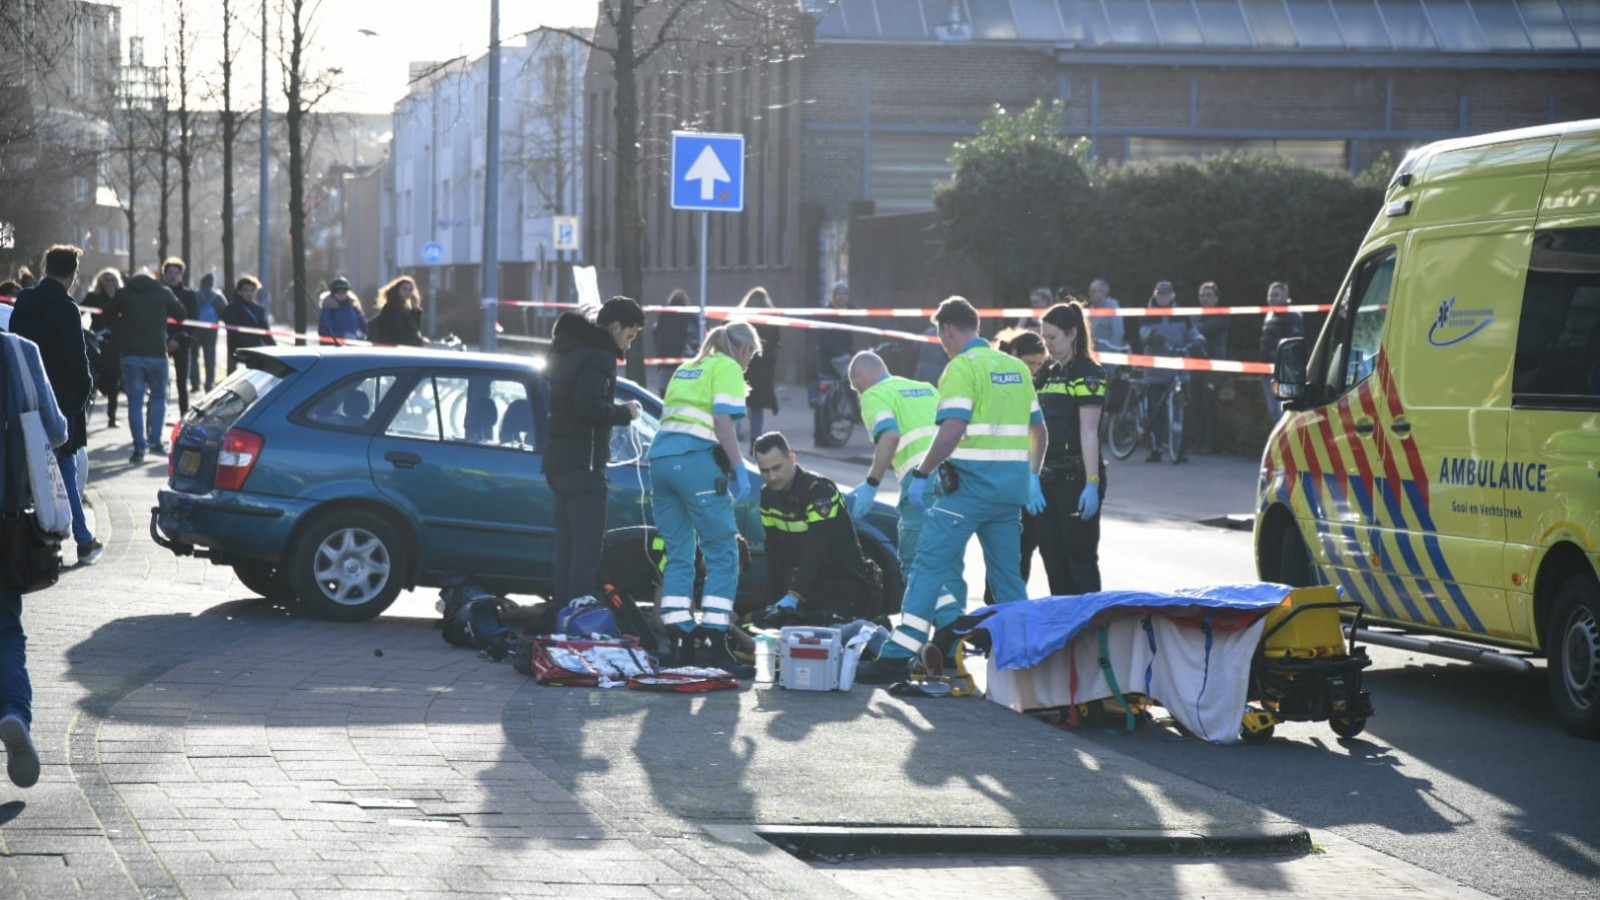 Twee gewonden na flinke botsing tussen auto en scooter in Hilversum.